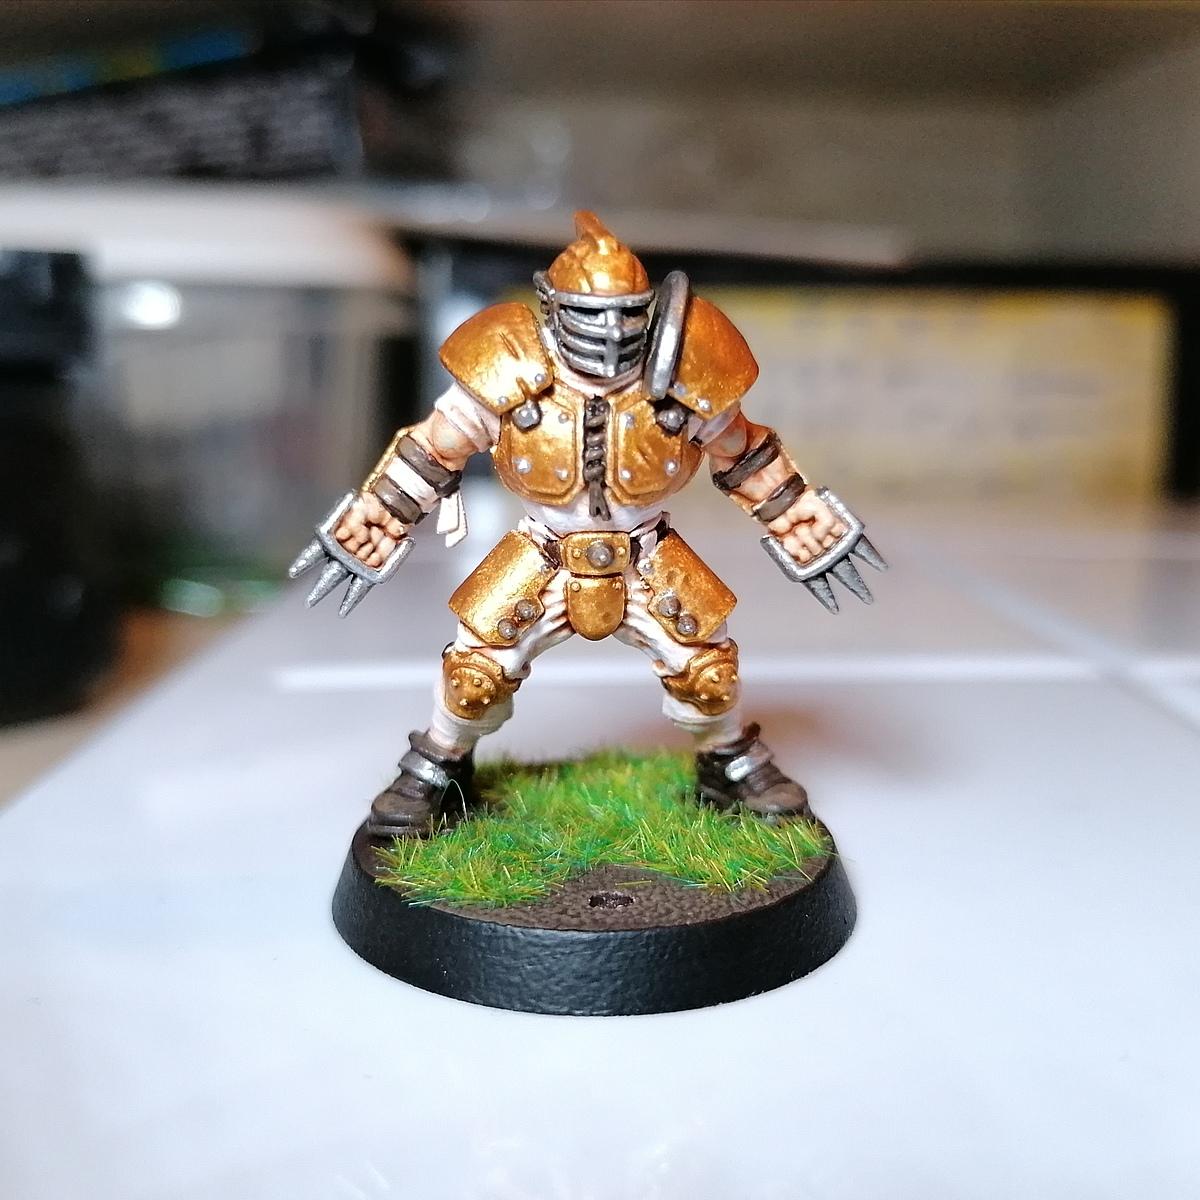 Gravewild Templars (Human Blood Bowl Team)